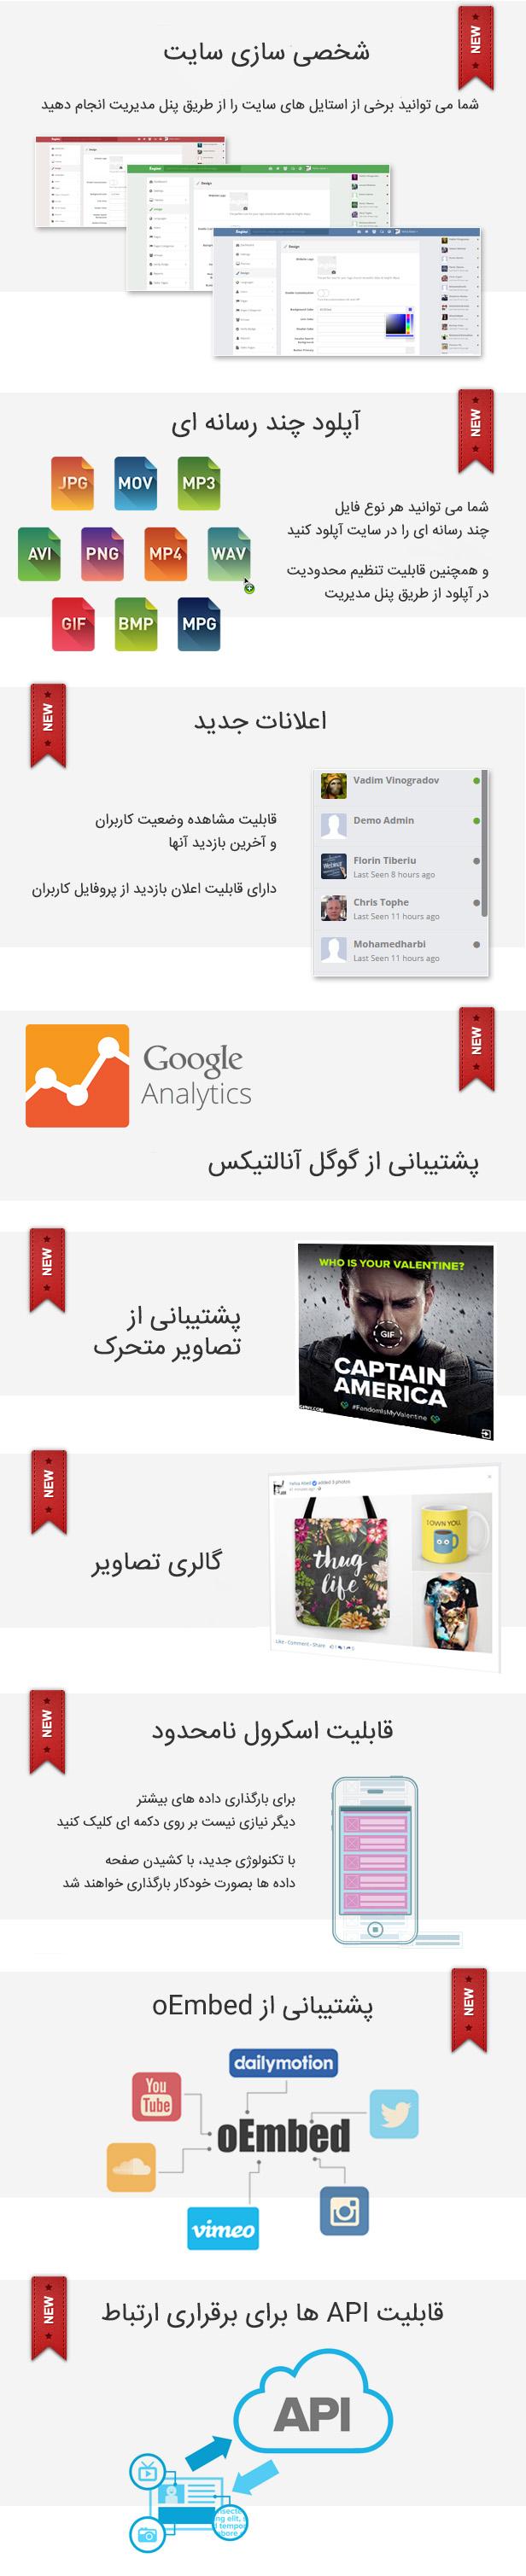 sngine feathers 2 namaket - اسکریپت شبکه اجتماعی سنجین فارسی